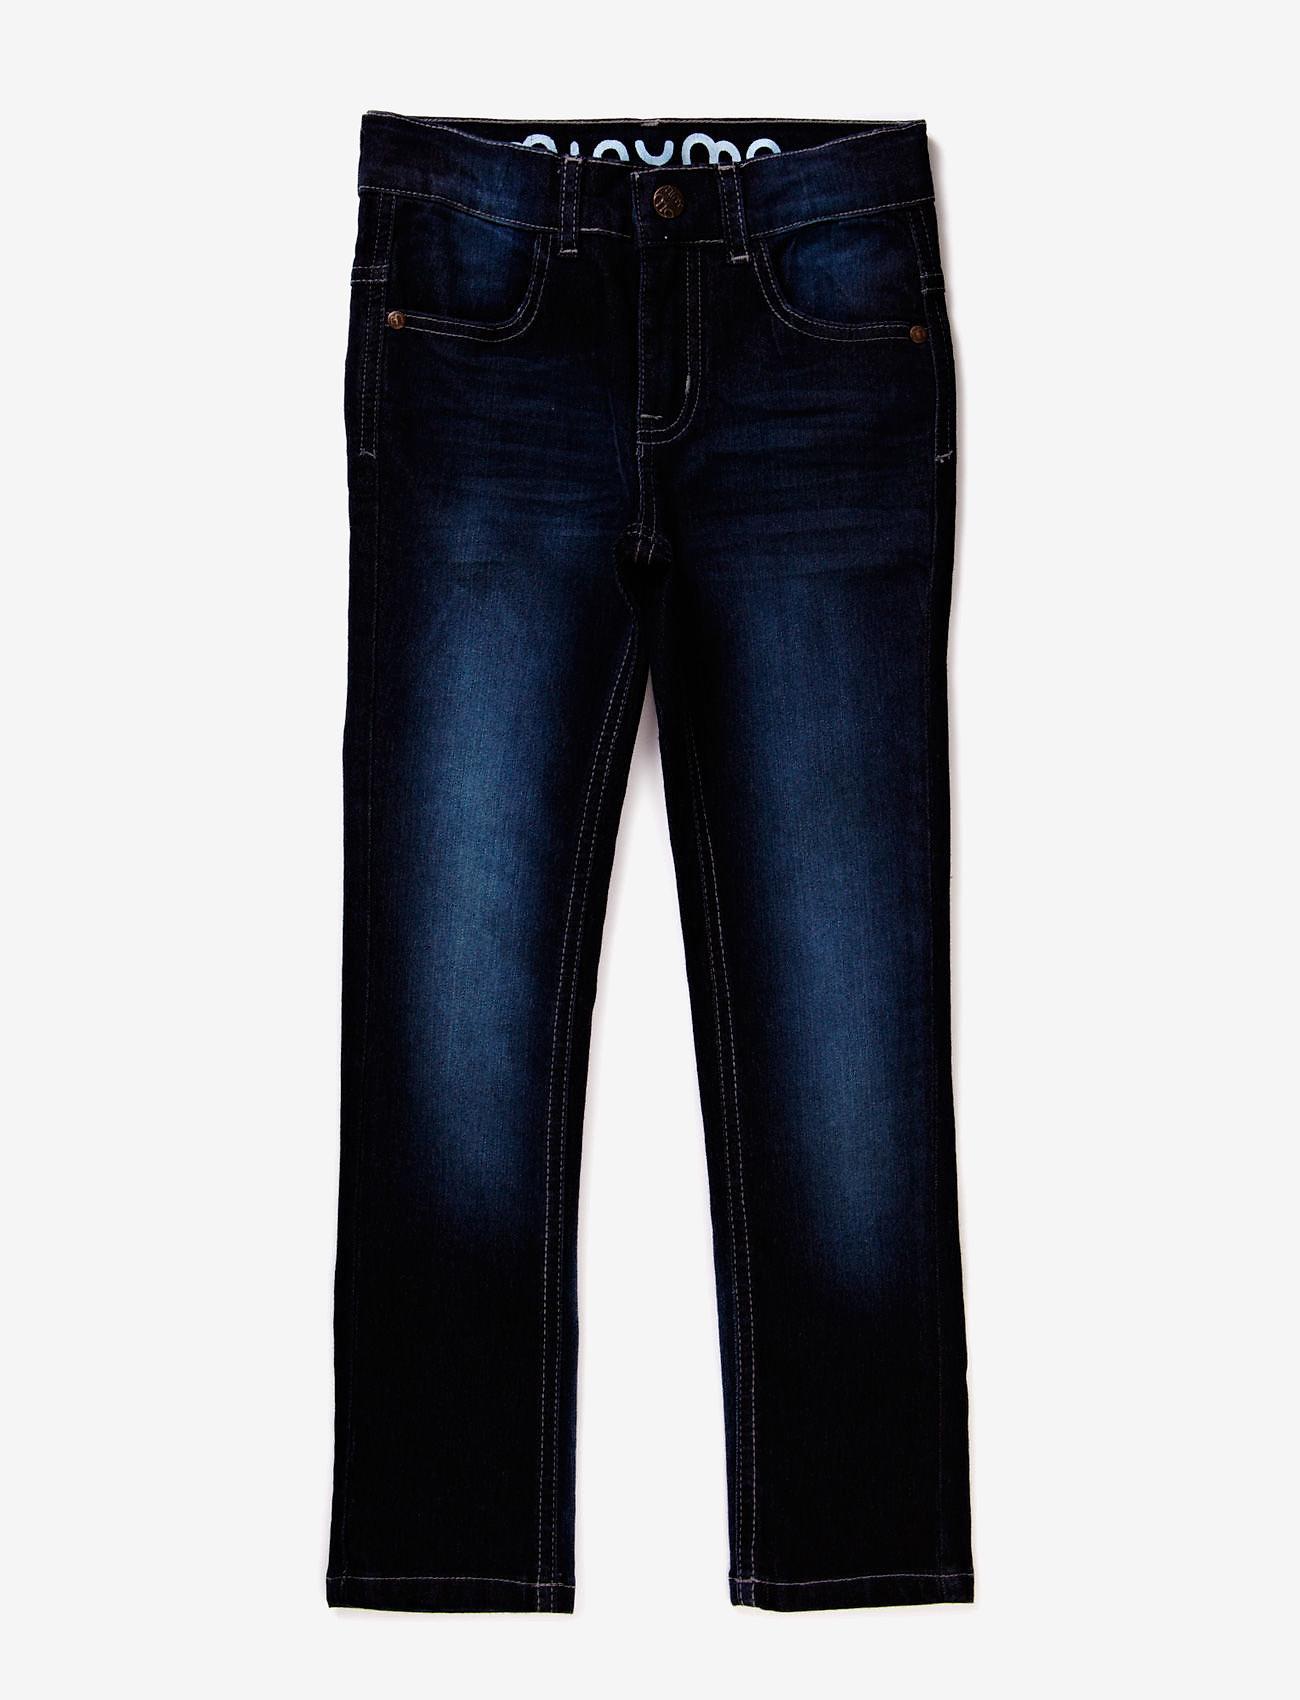 Minymo - Jeans boy Malvin - Slim fit - farkut - dark blue denim - 0